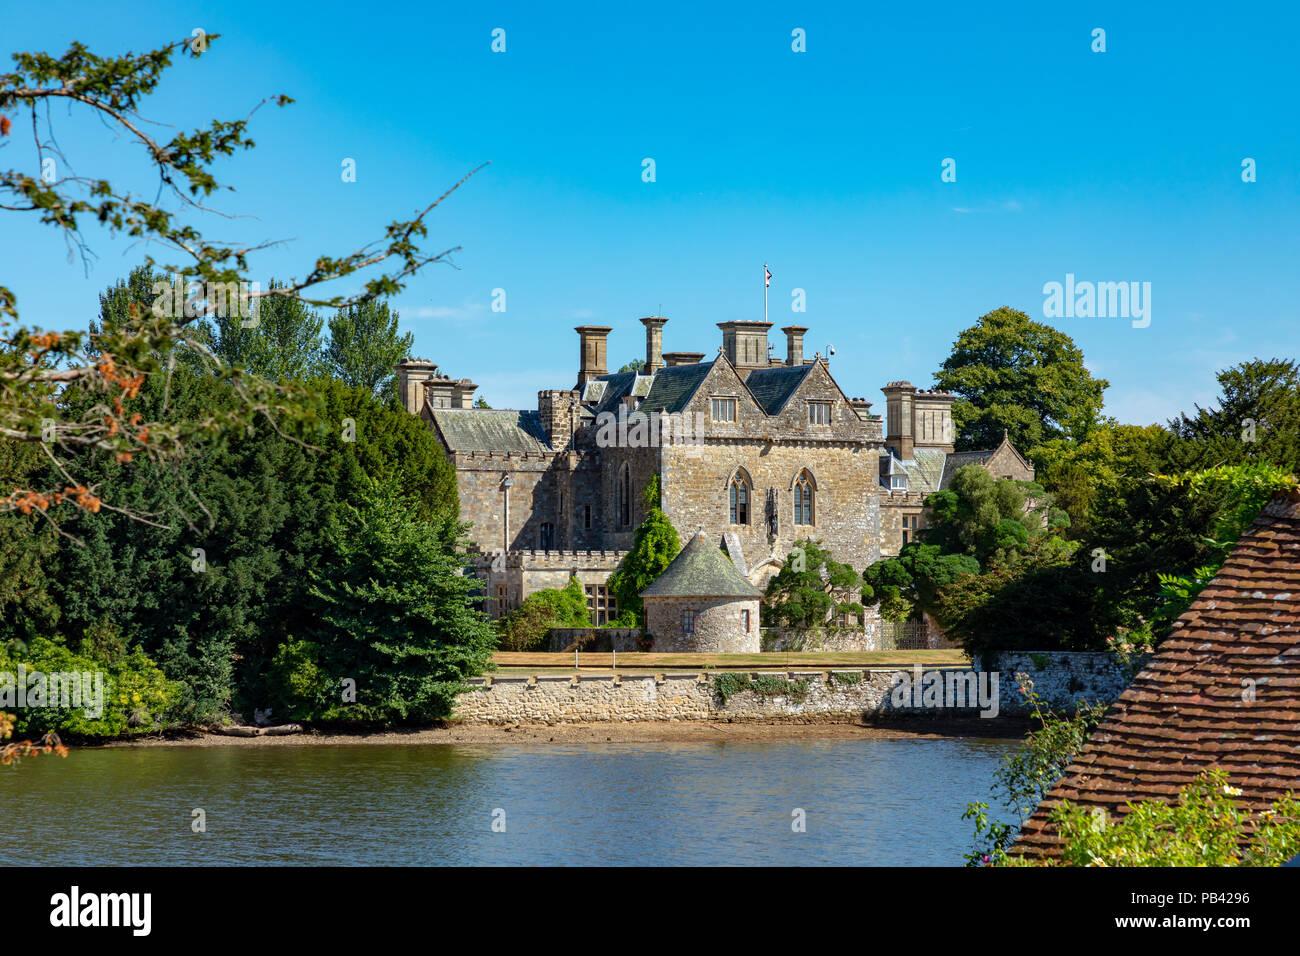 Beaulieu Hampshire England Juli 23, 2018 Die Palace House, über die Beaulieu River gesehen Stockbild